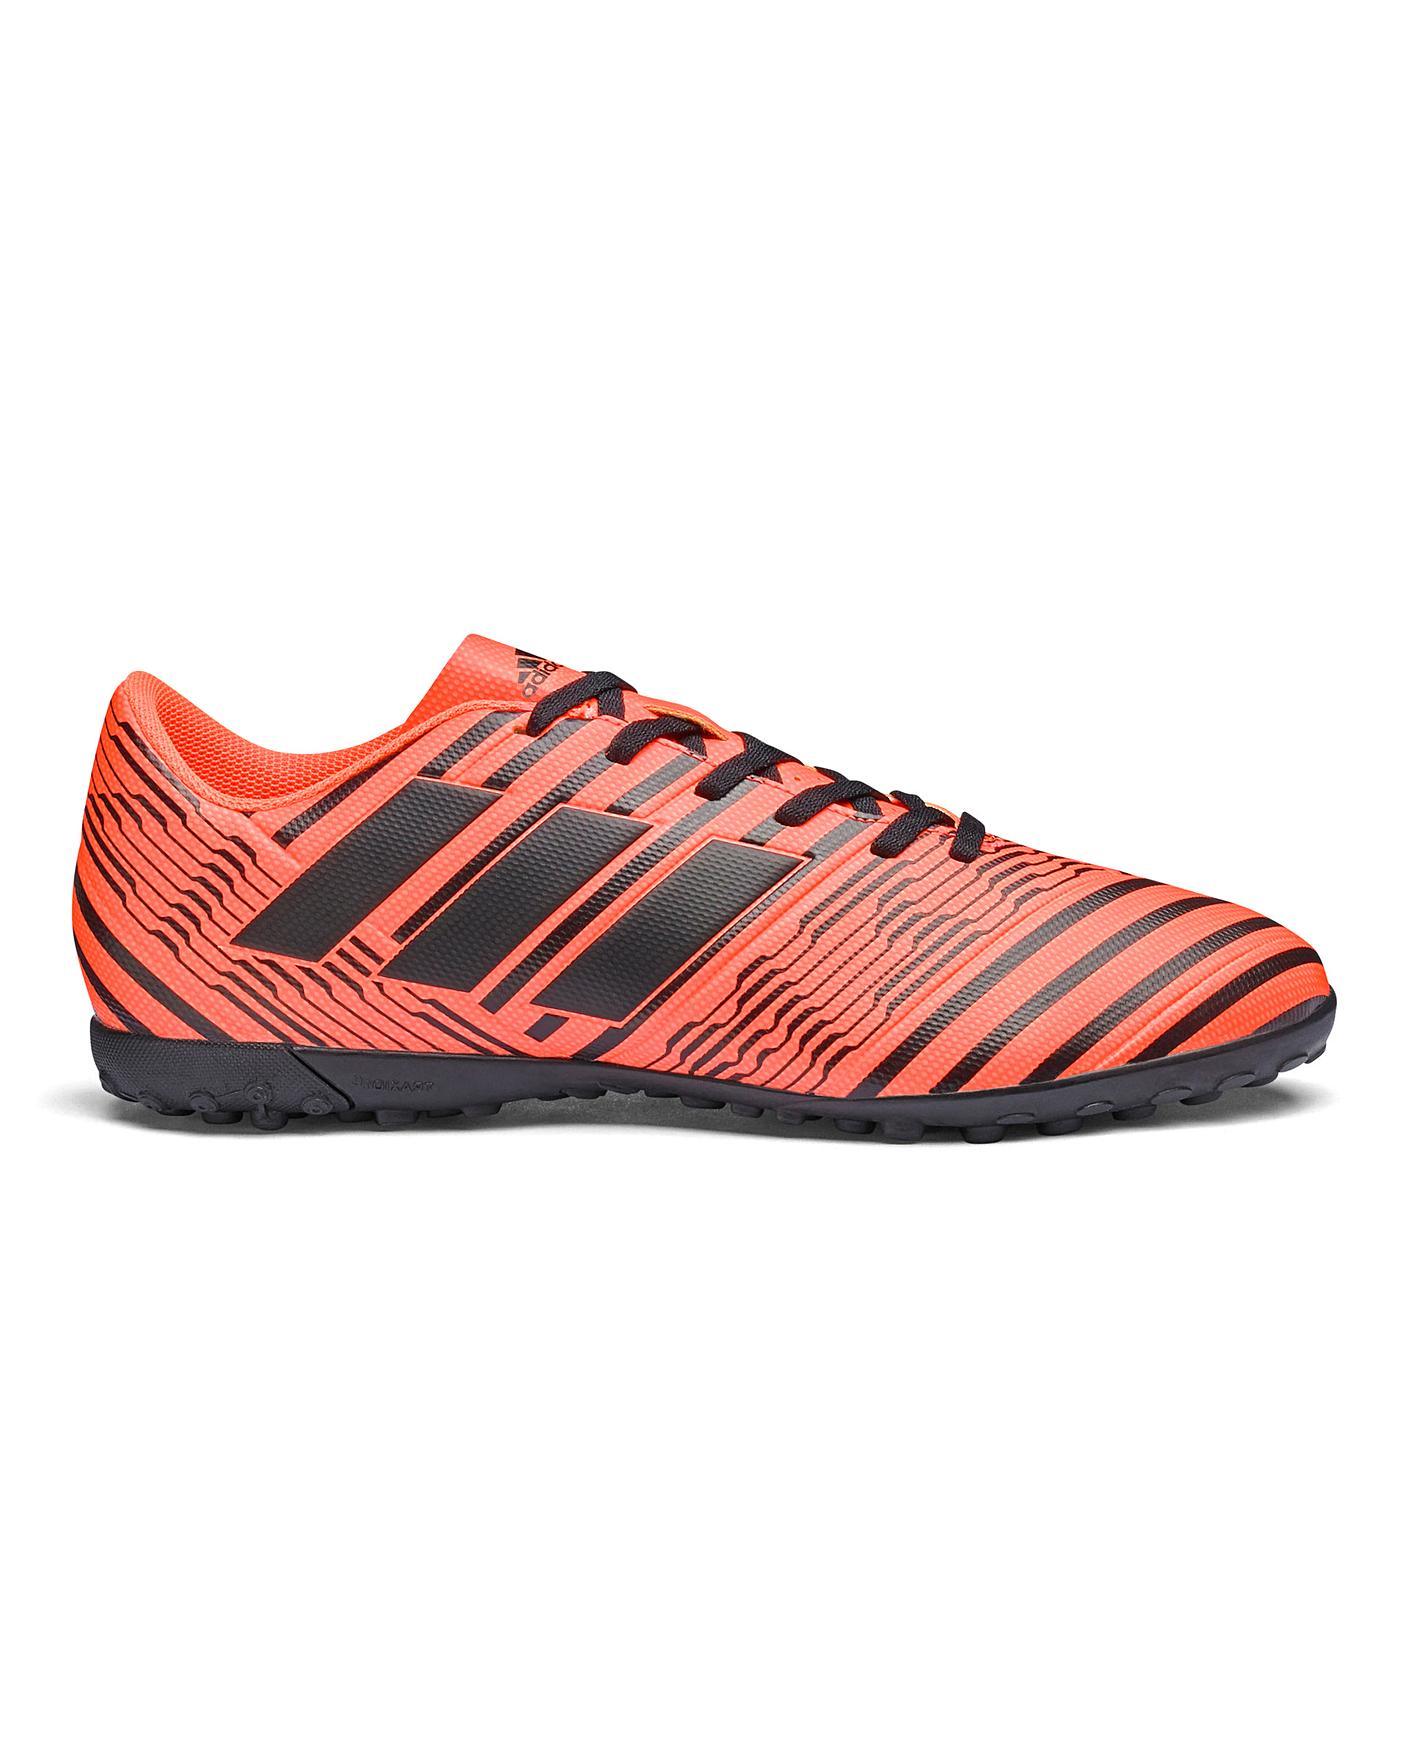 adidas nemeziz 17.4 tf football boots mens